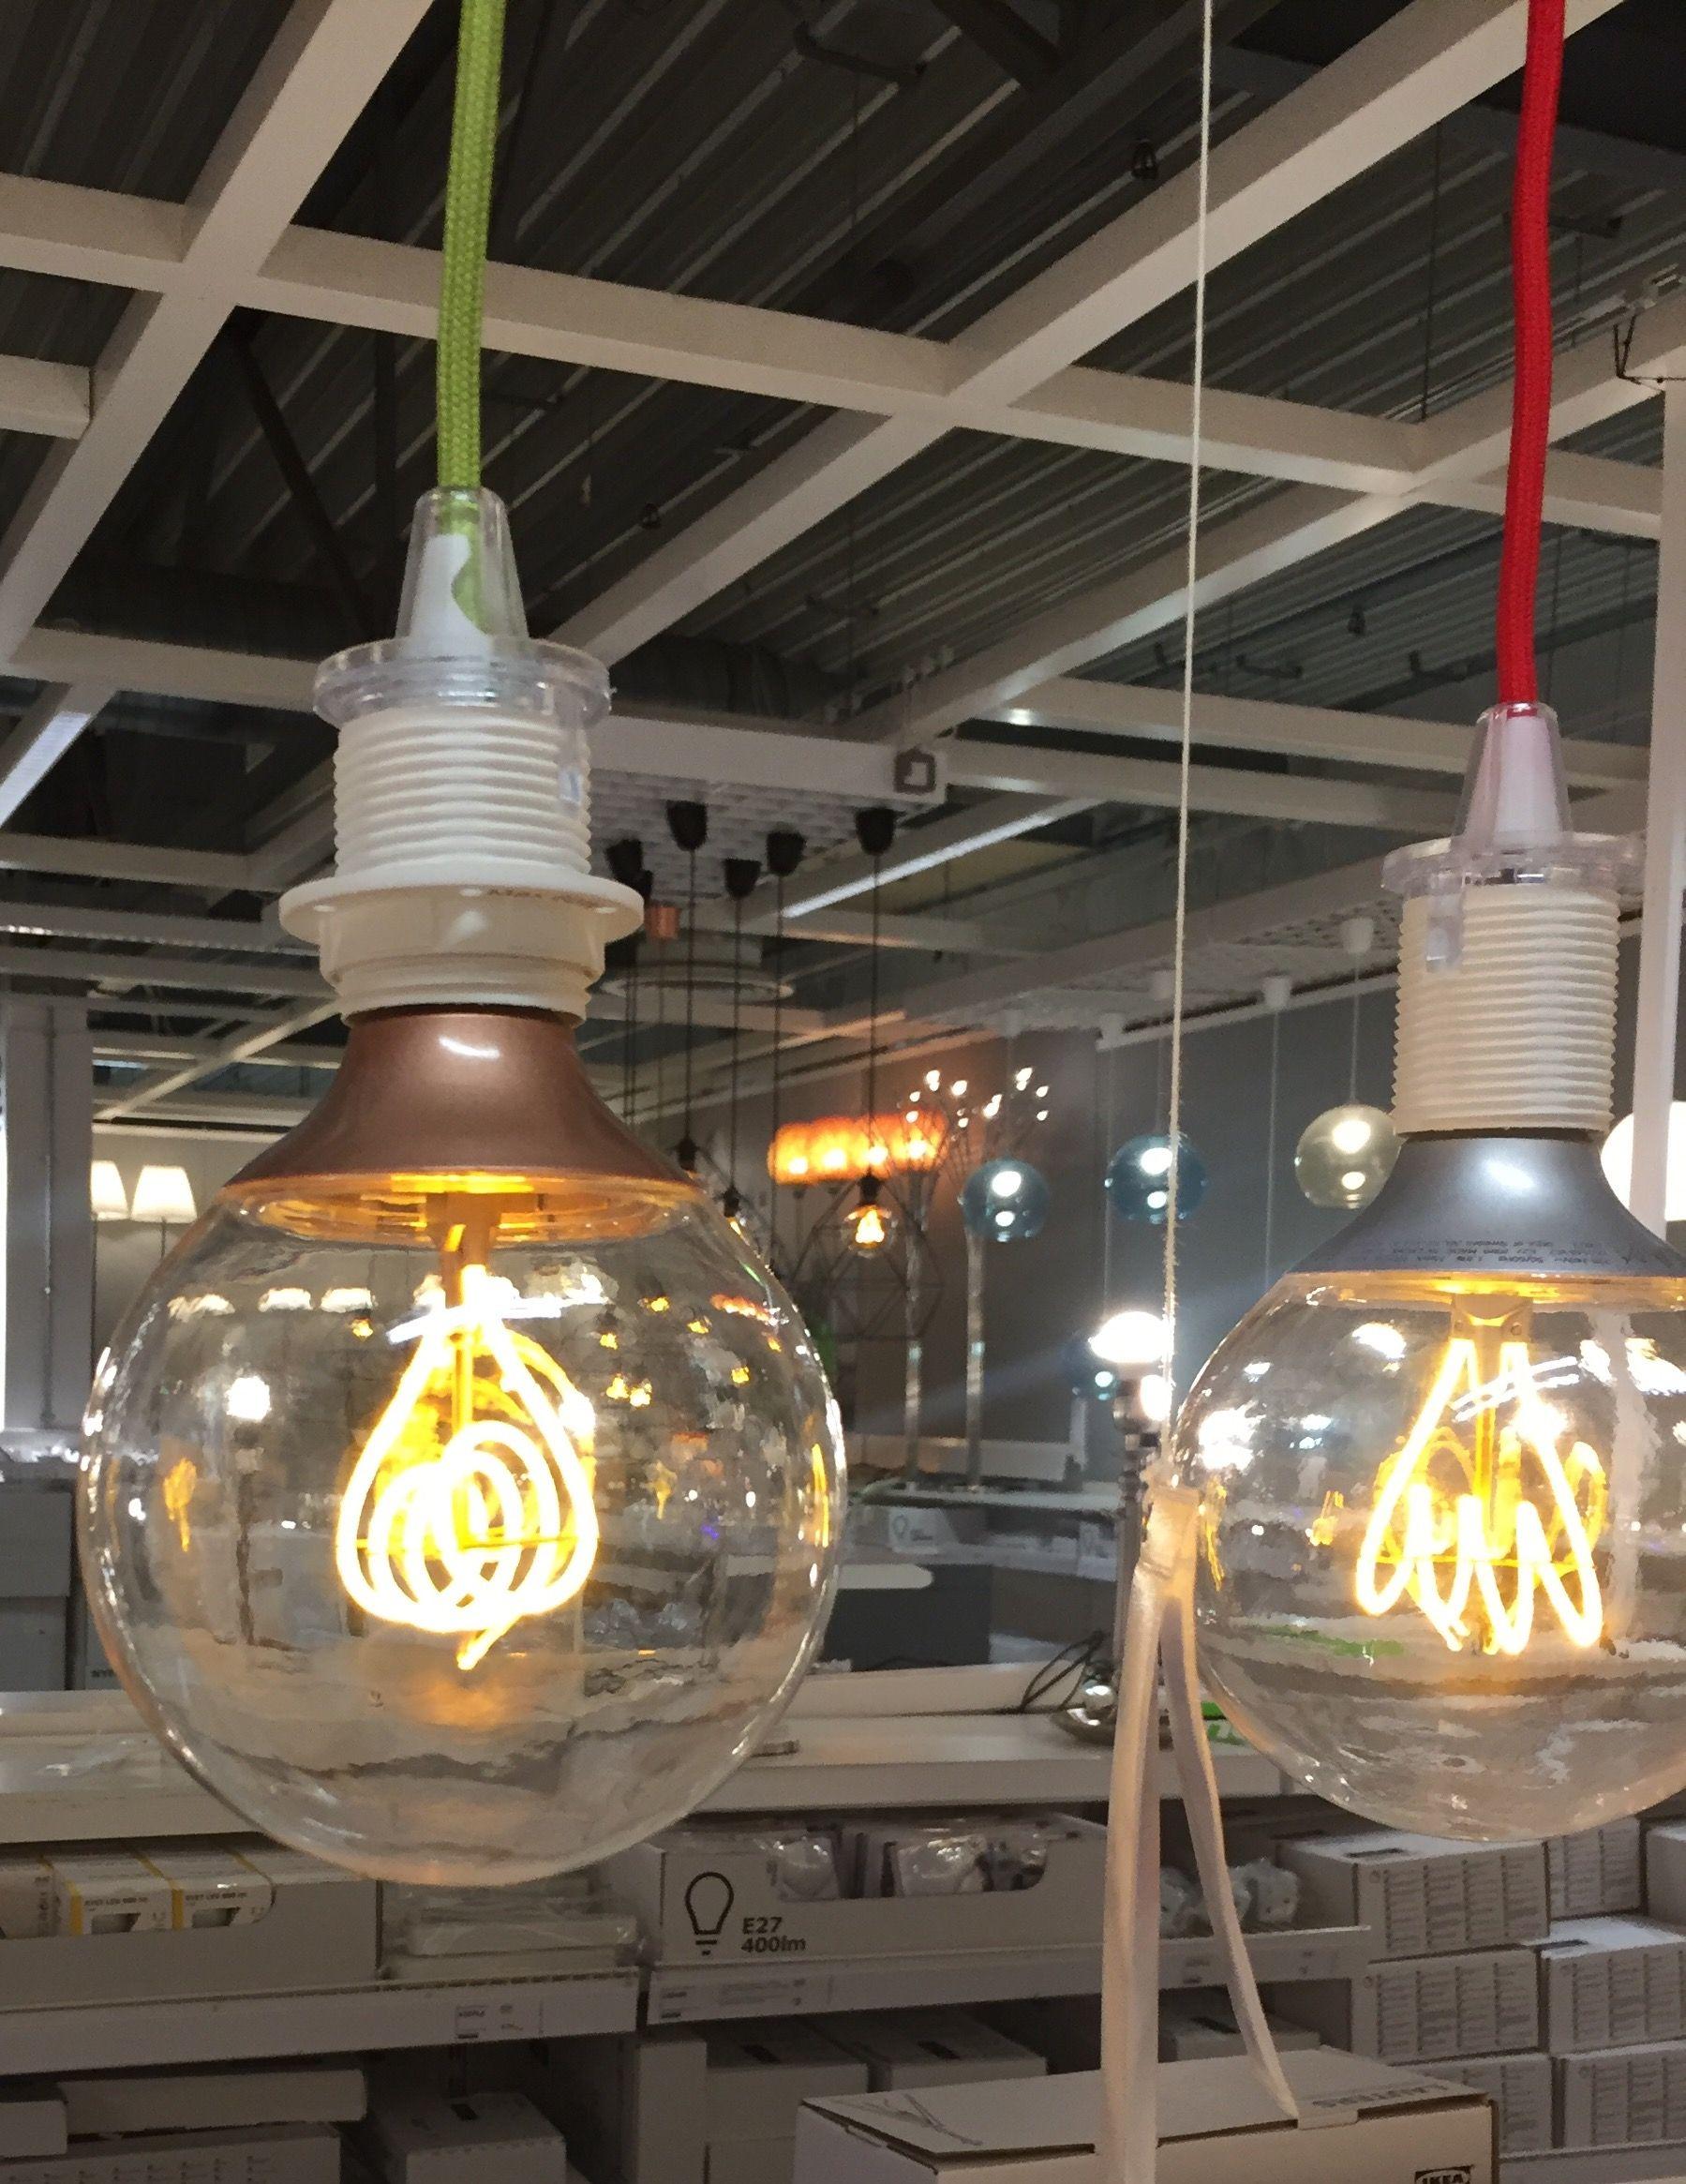 Ikea 'NITTIO' Bulbs Give Cool Edison